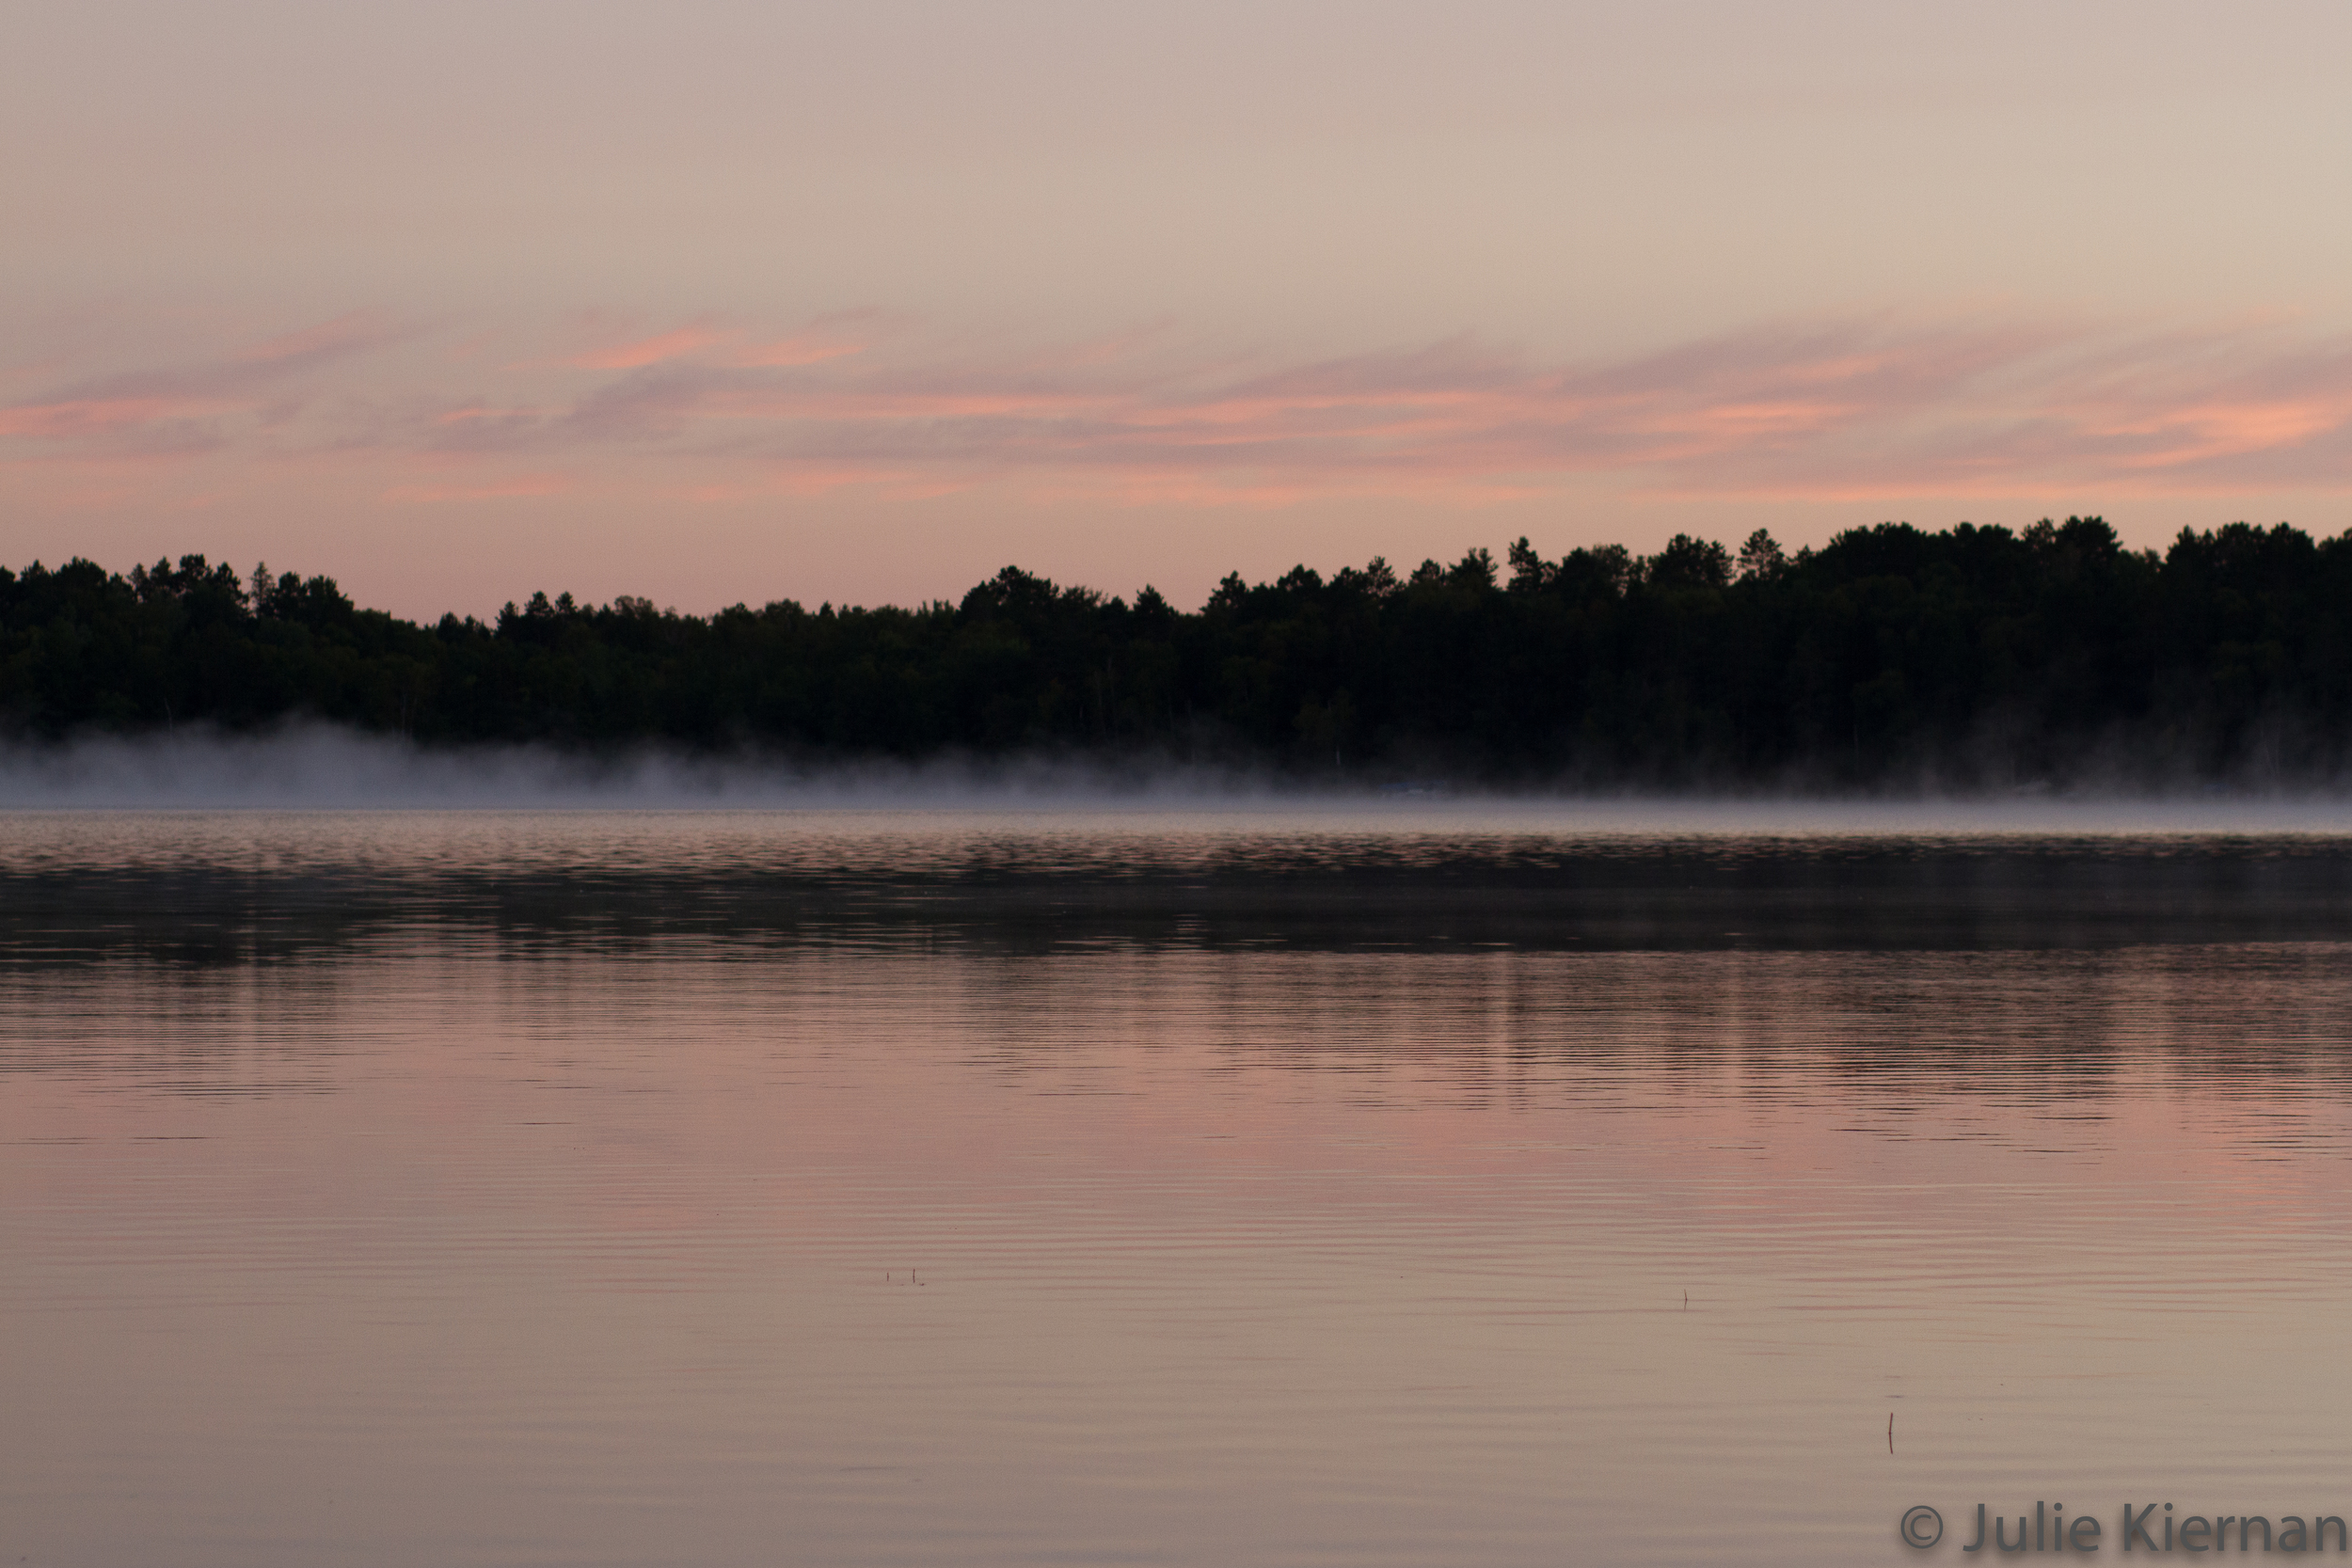 Sunrise fog on the lake at the cabin 8:52